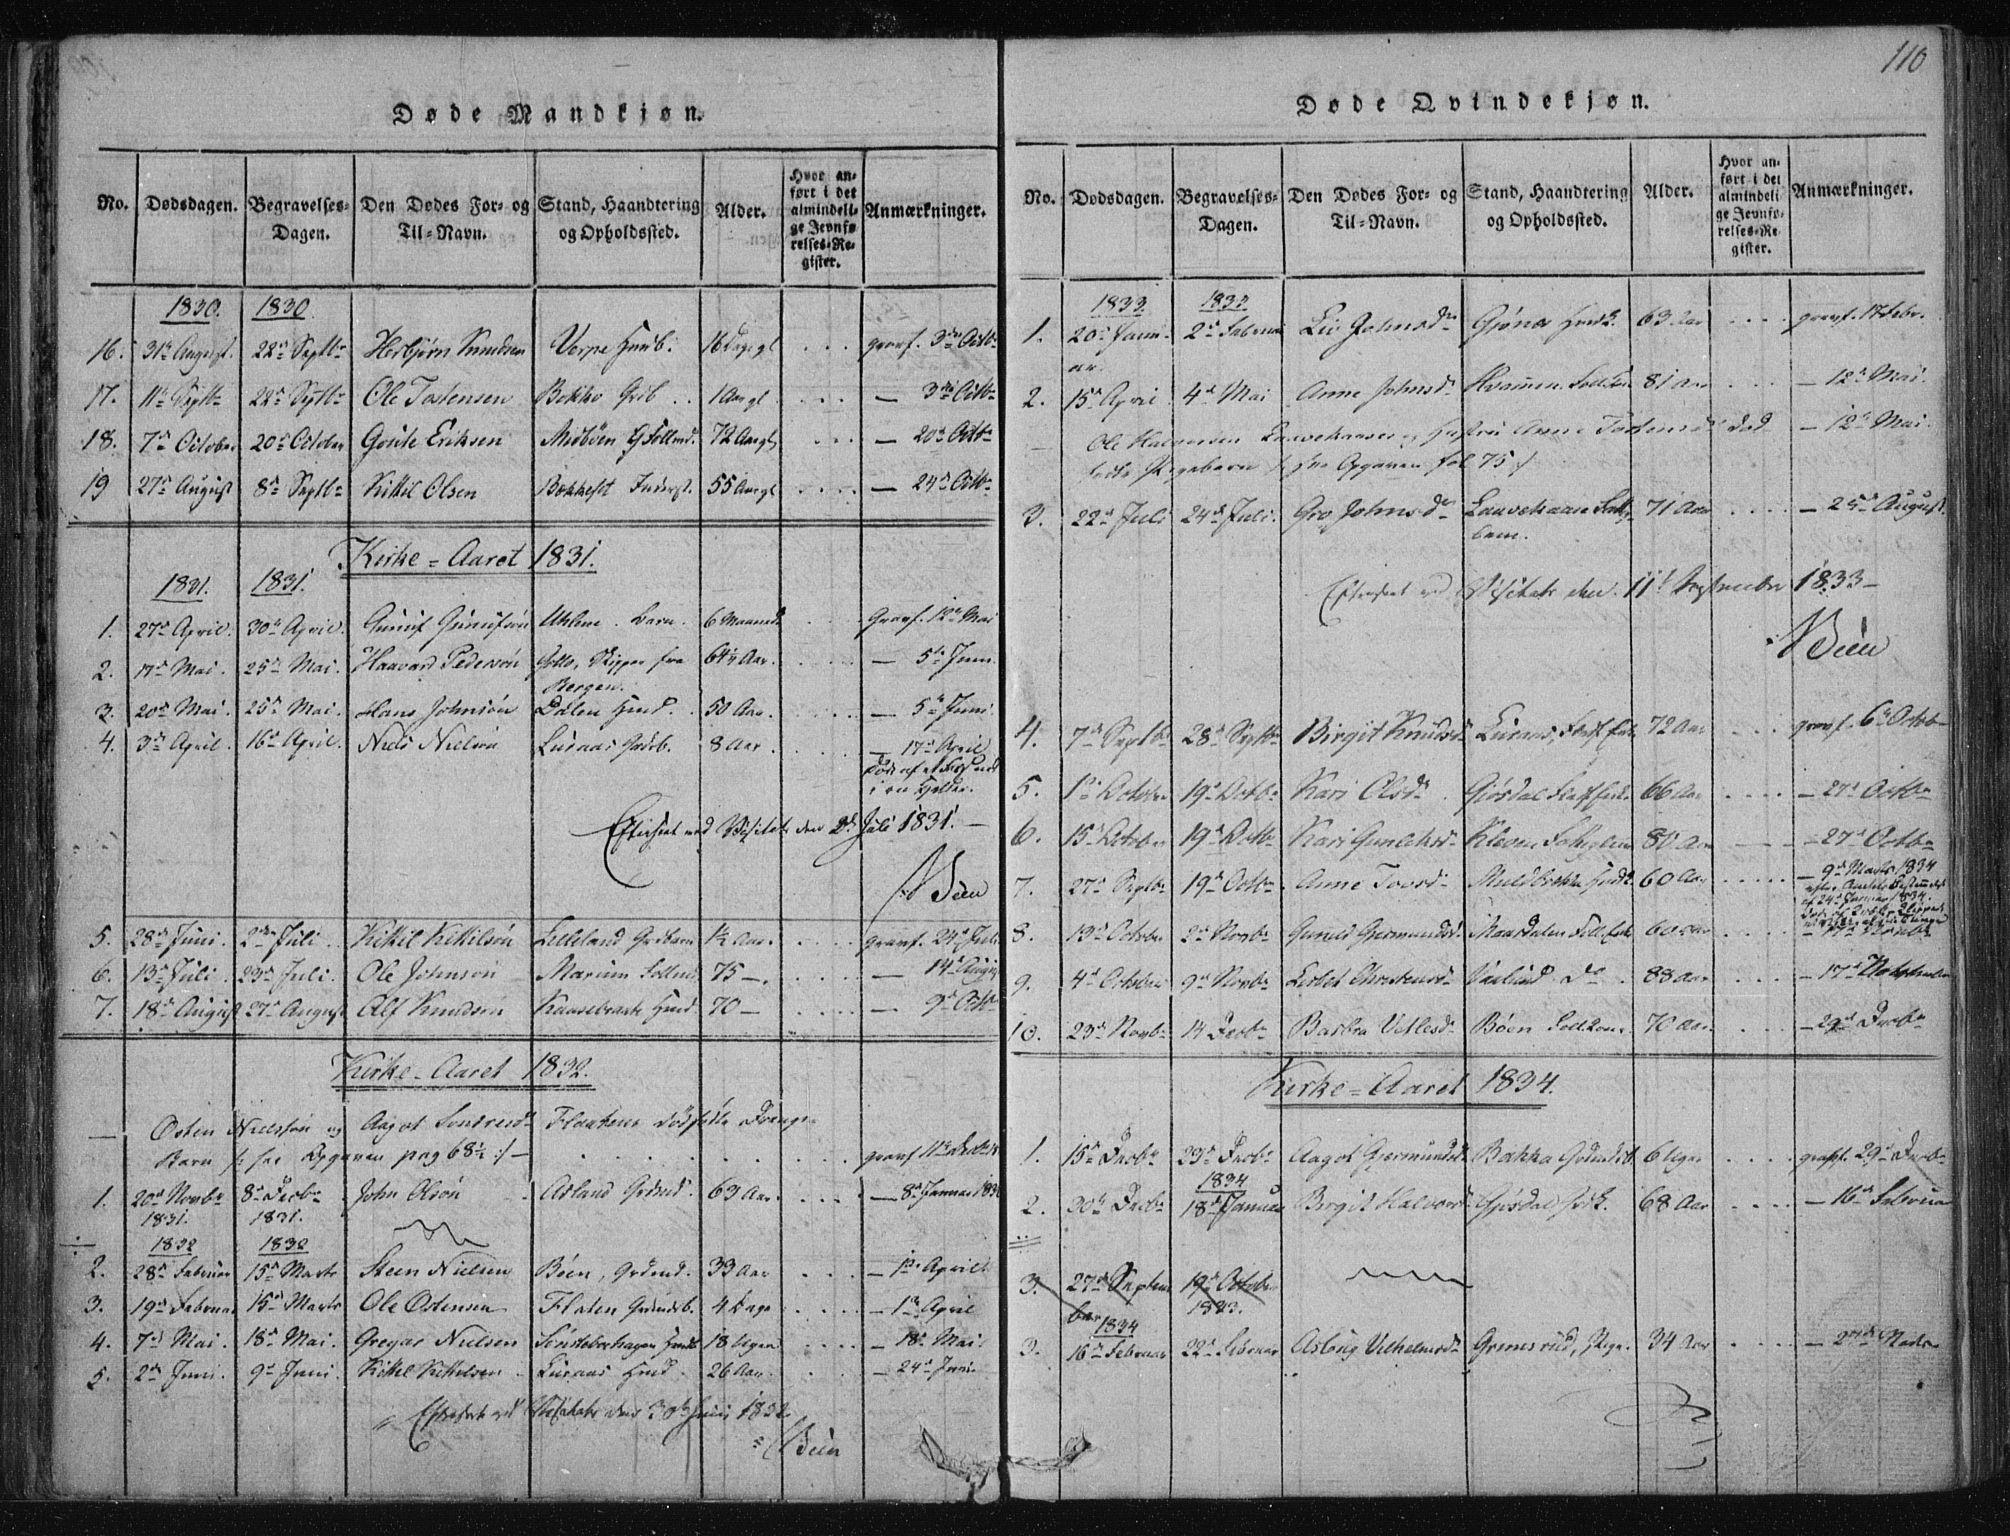 SAKO, Tinn kirkebøker, F/Fa/L0004: Ministerialbok nr. I 4, 1815-1843, s. 110